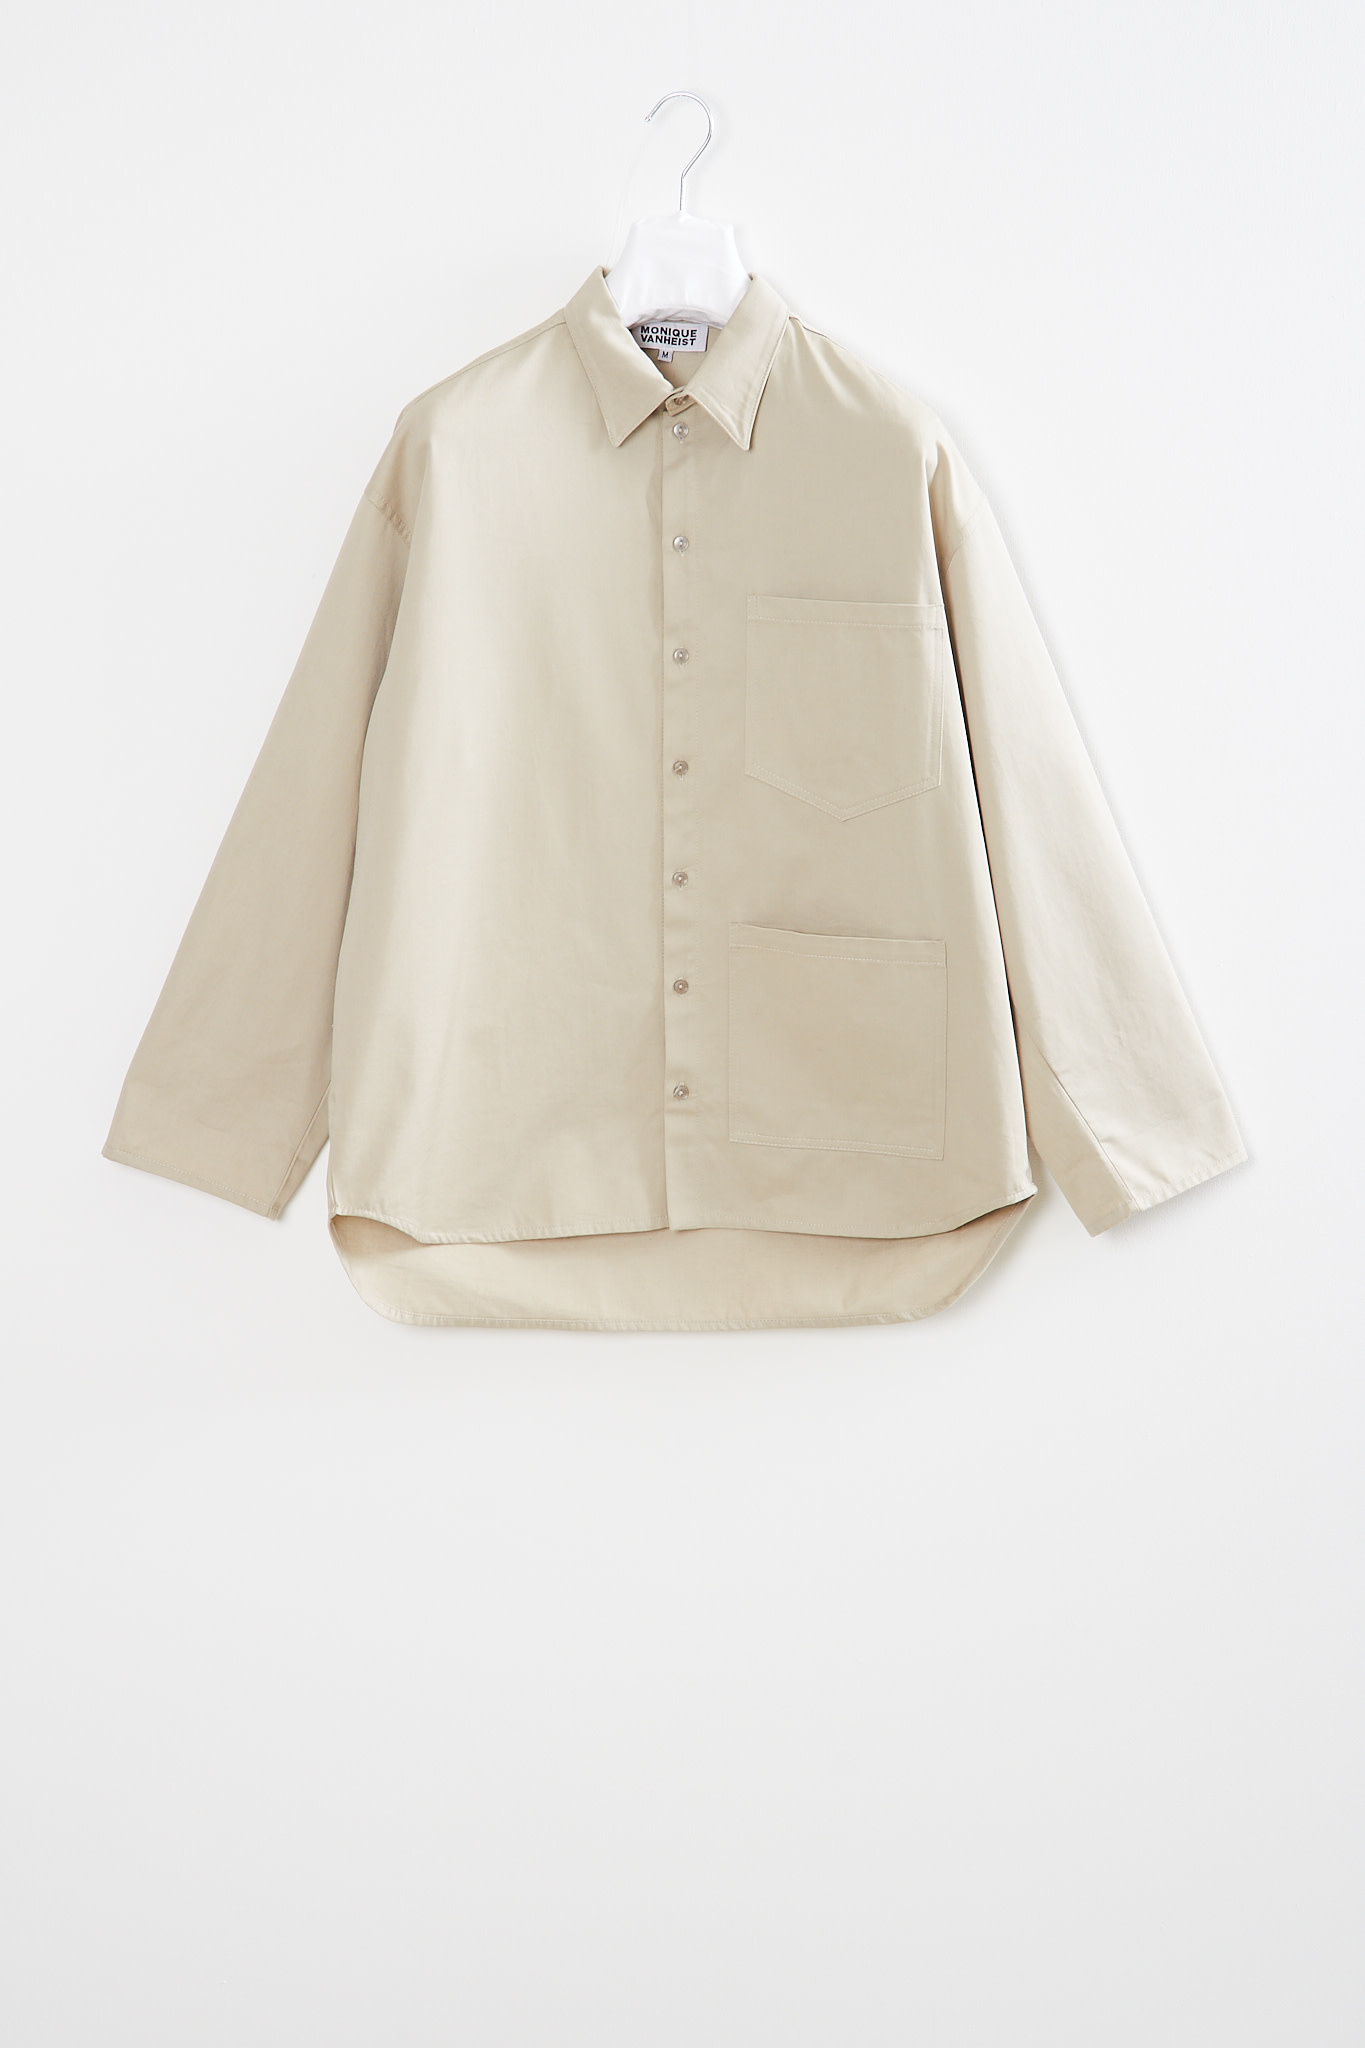 Monique van Heist 5.2 organic cotton shirt